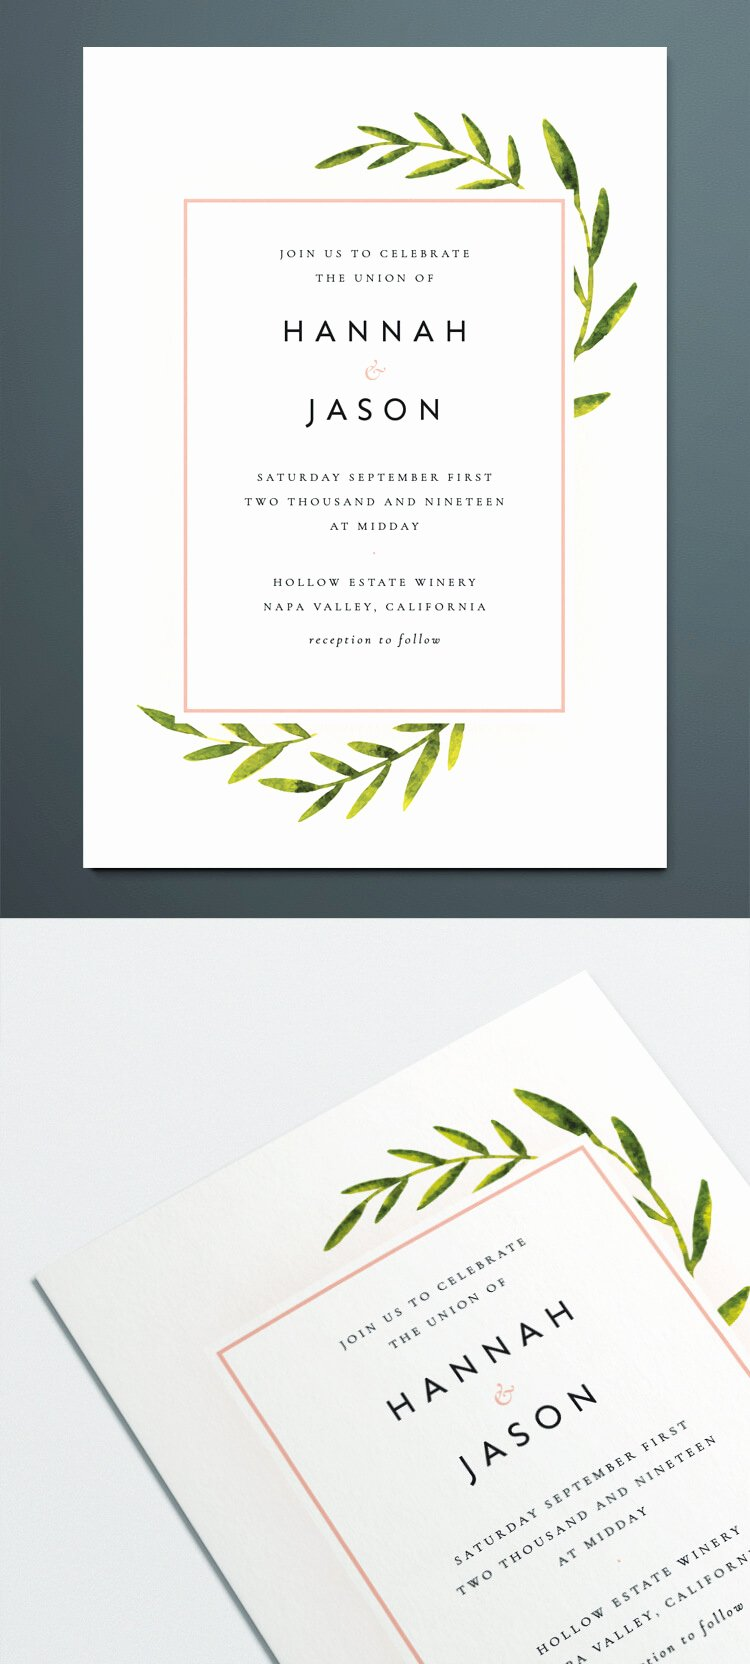 Indesign Wedding Program Template Best Of Vintage Business Card Template for Indesign